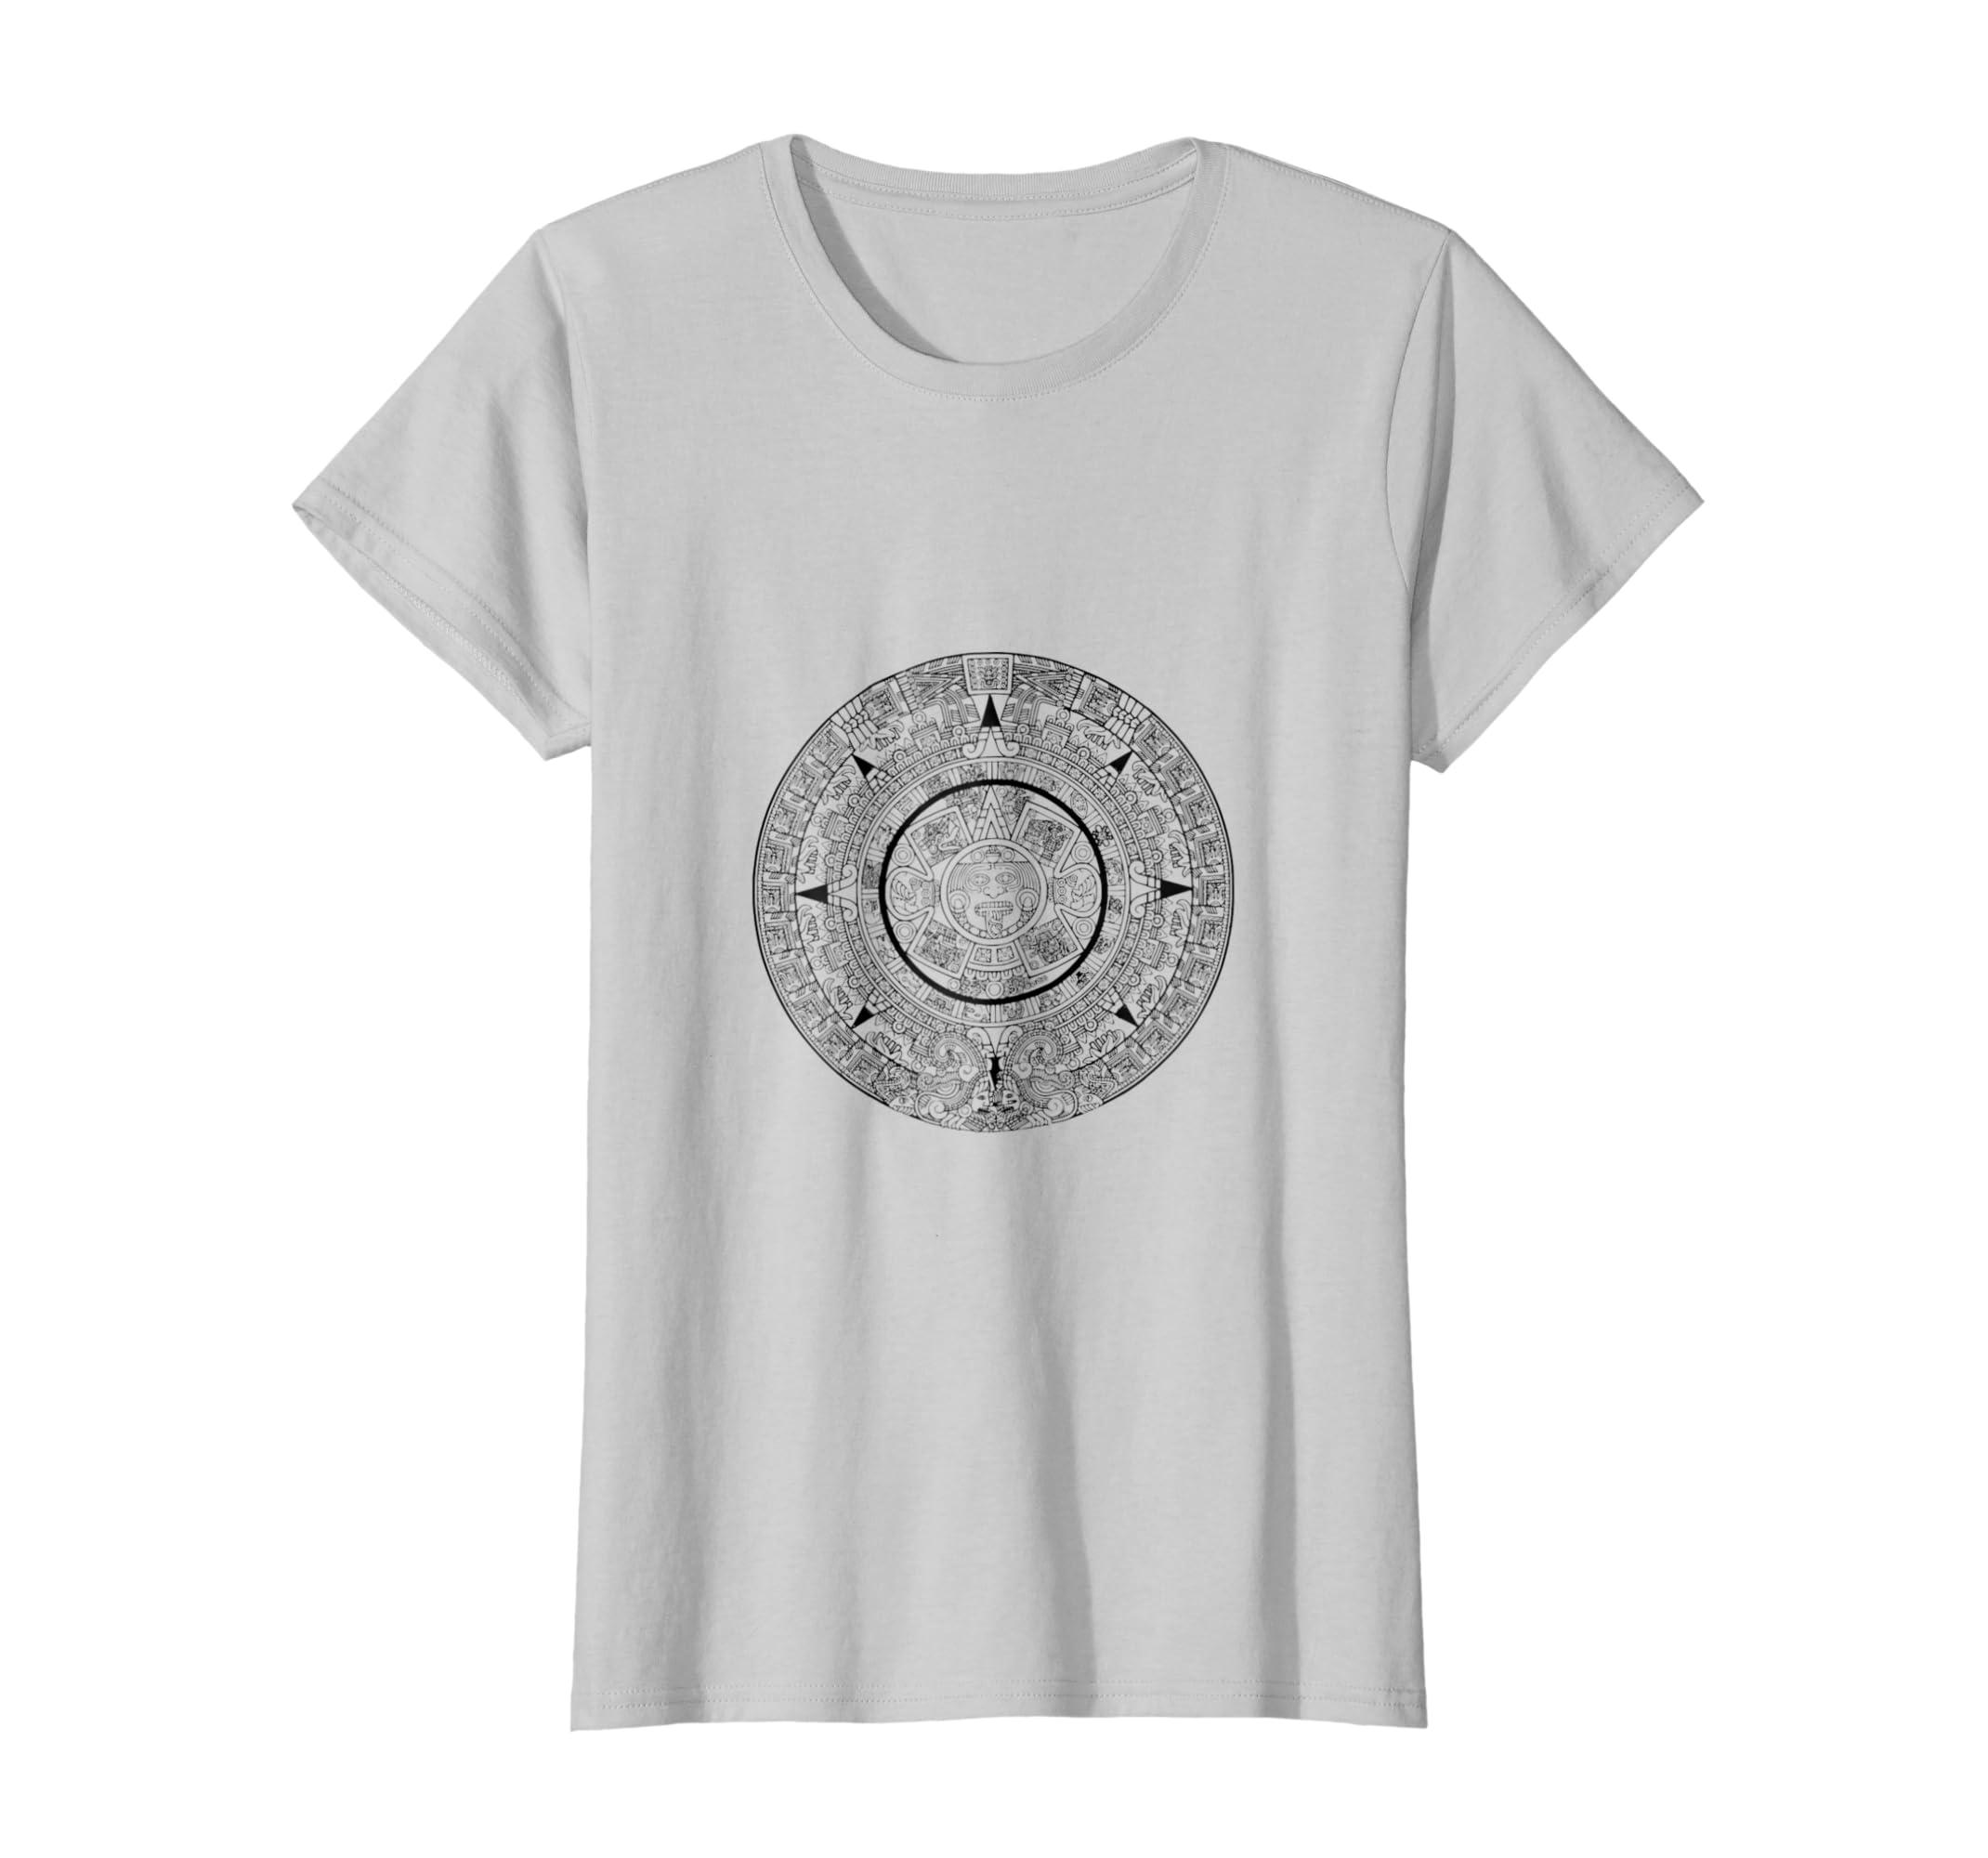 1cf05f6f0 Amazon.com: Aztec T-Shirt Inca Empire Mexican Mayan Mythical Calendar:  Clothing